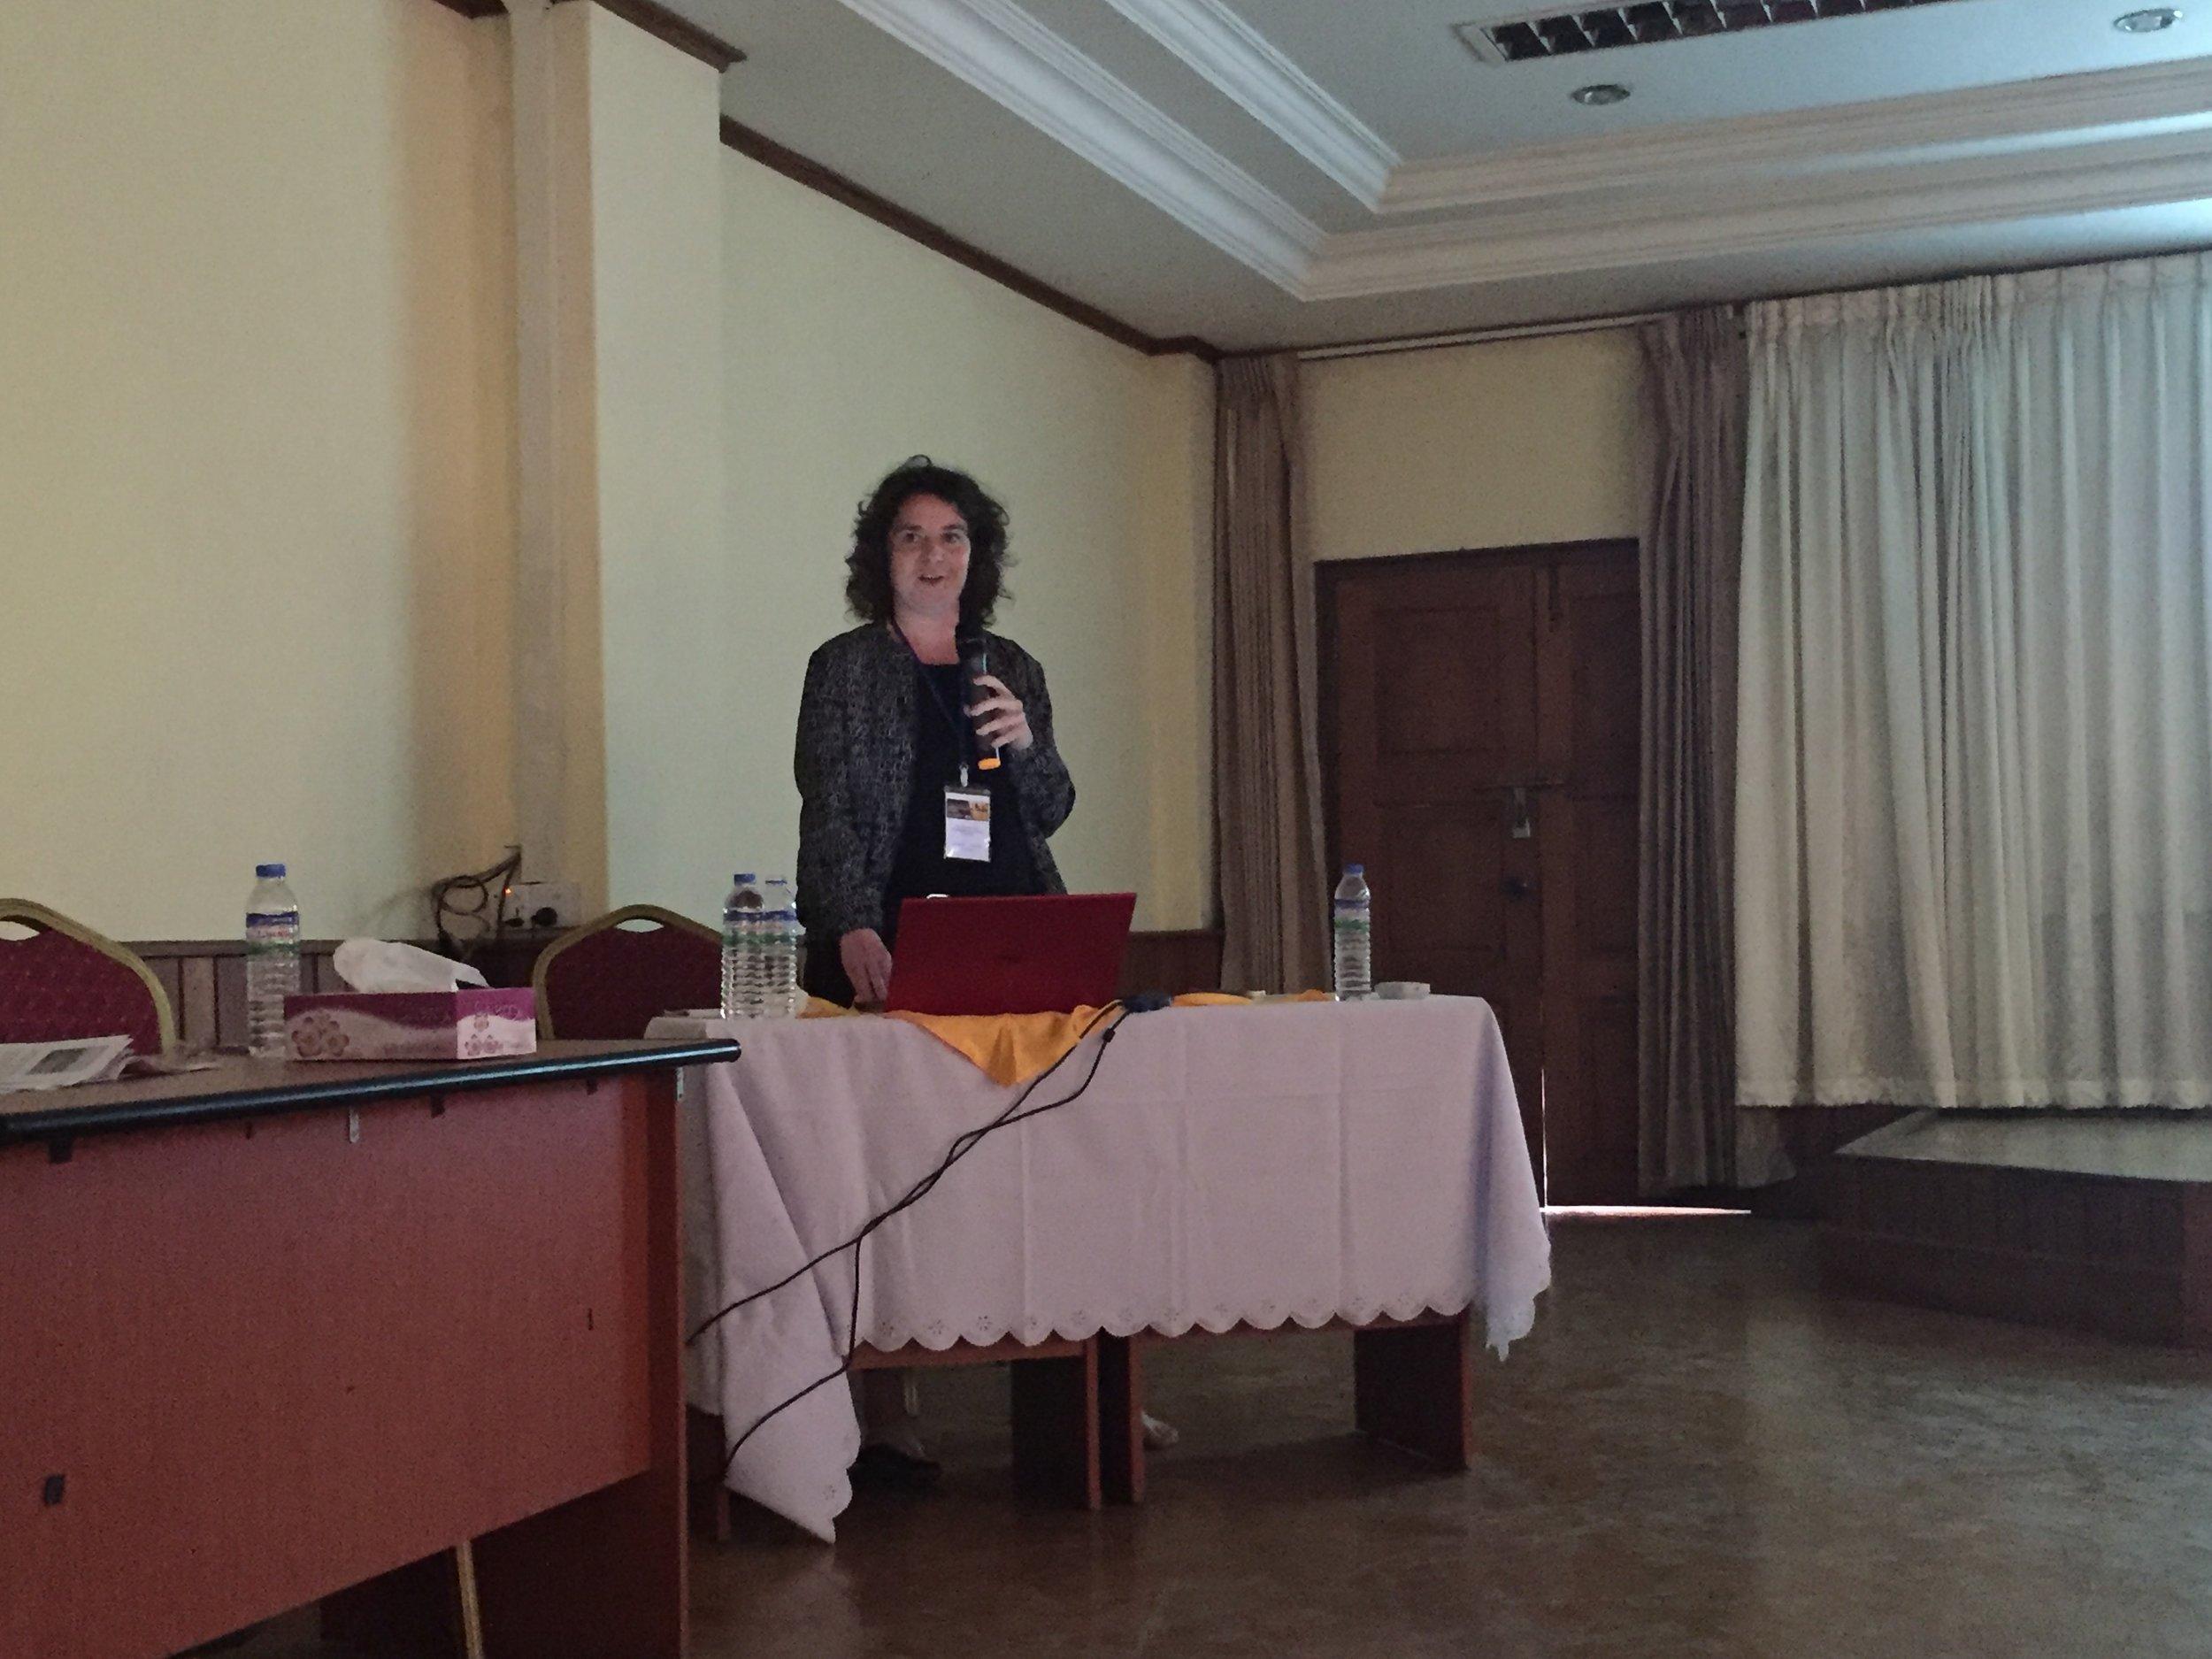 Joanna Göetz presenting